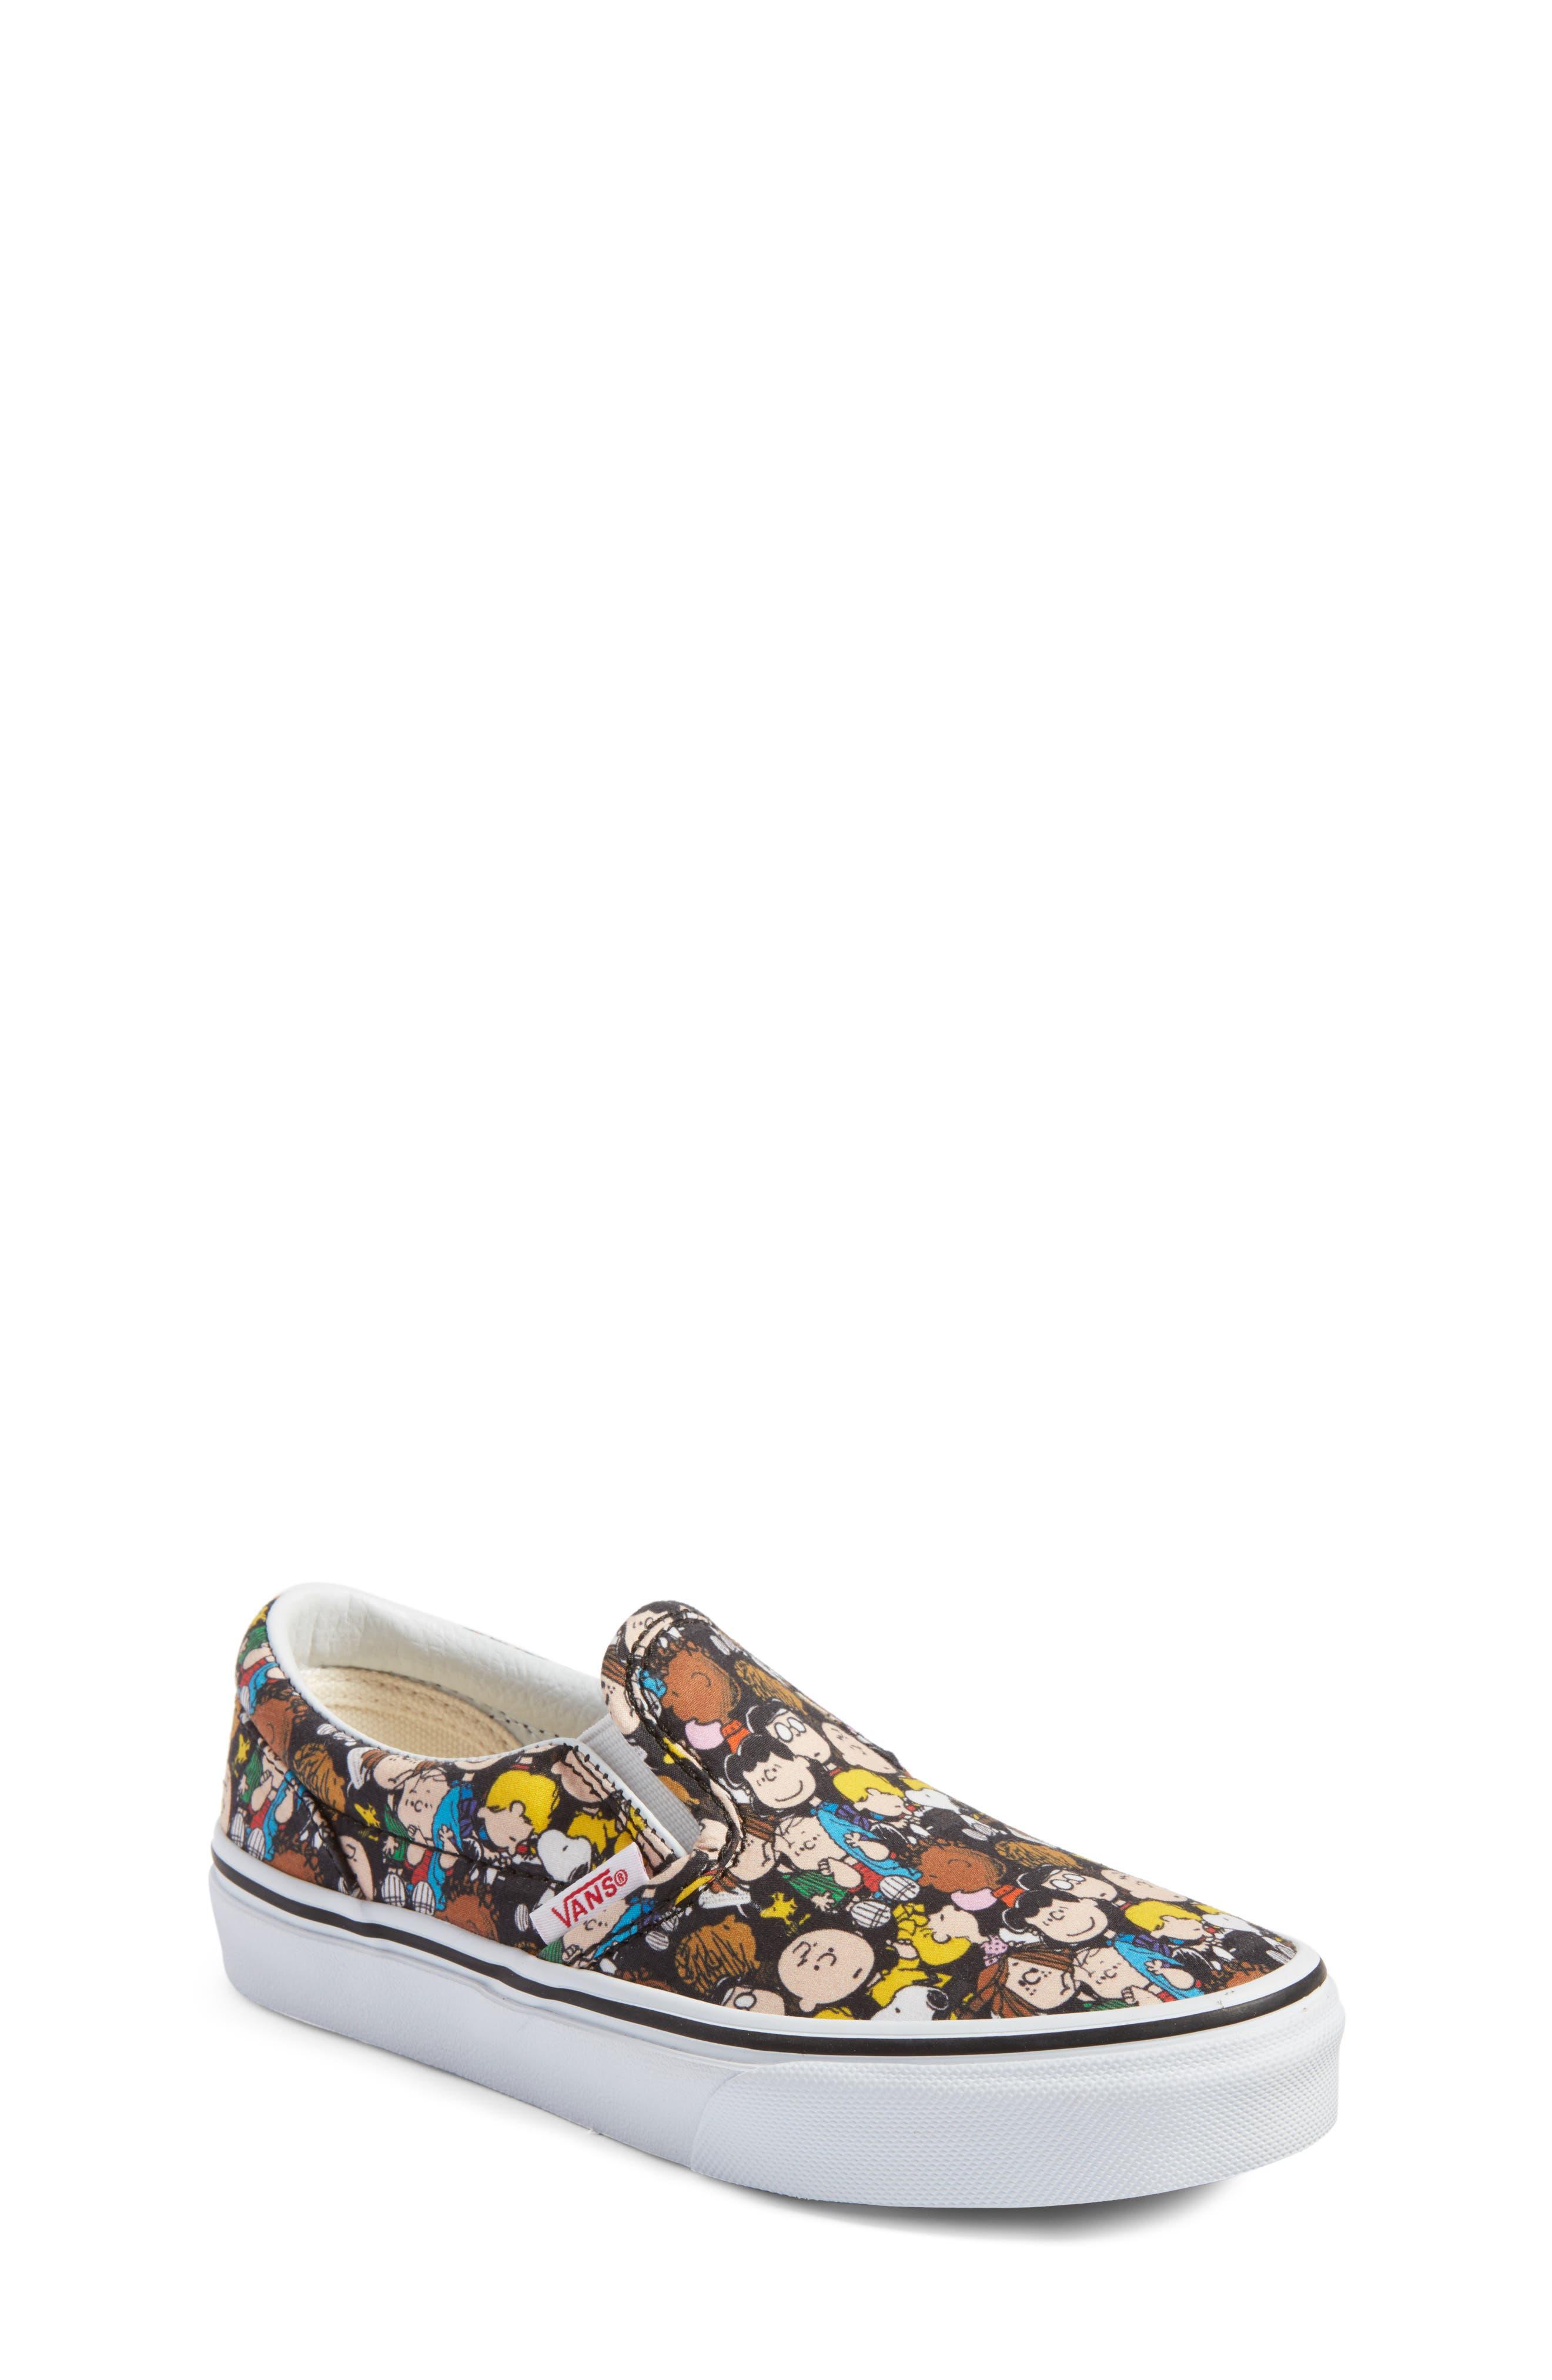 ee997b4db4 vans unicorn shoes sale   OFF69% Discounts